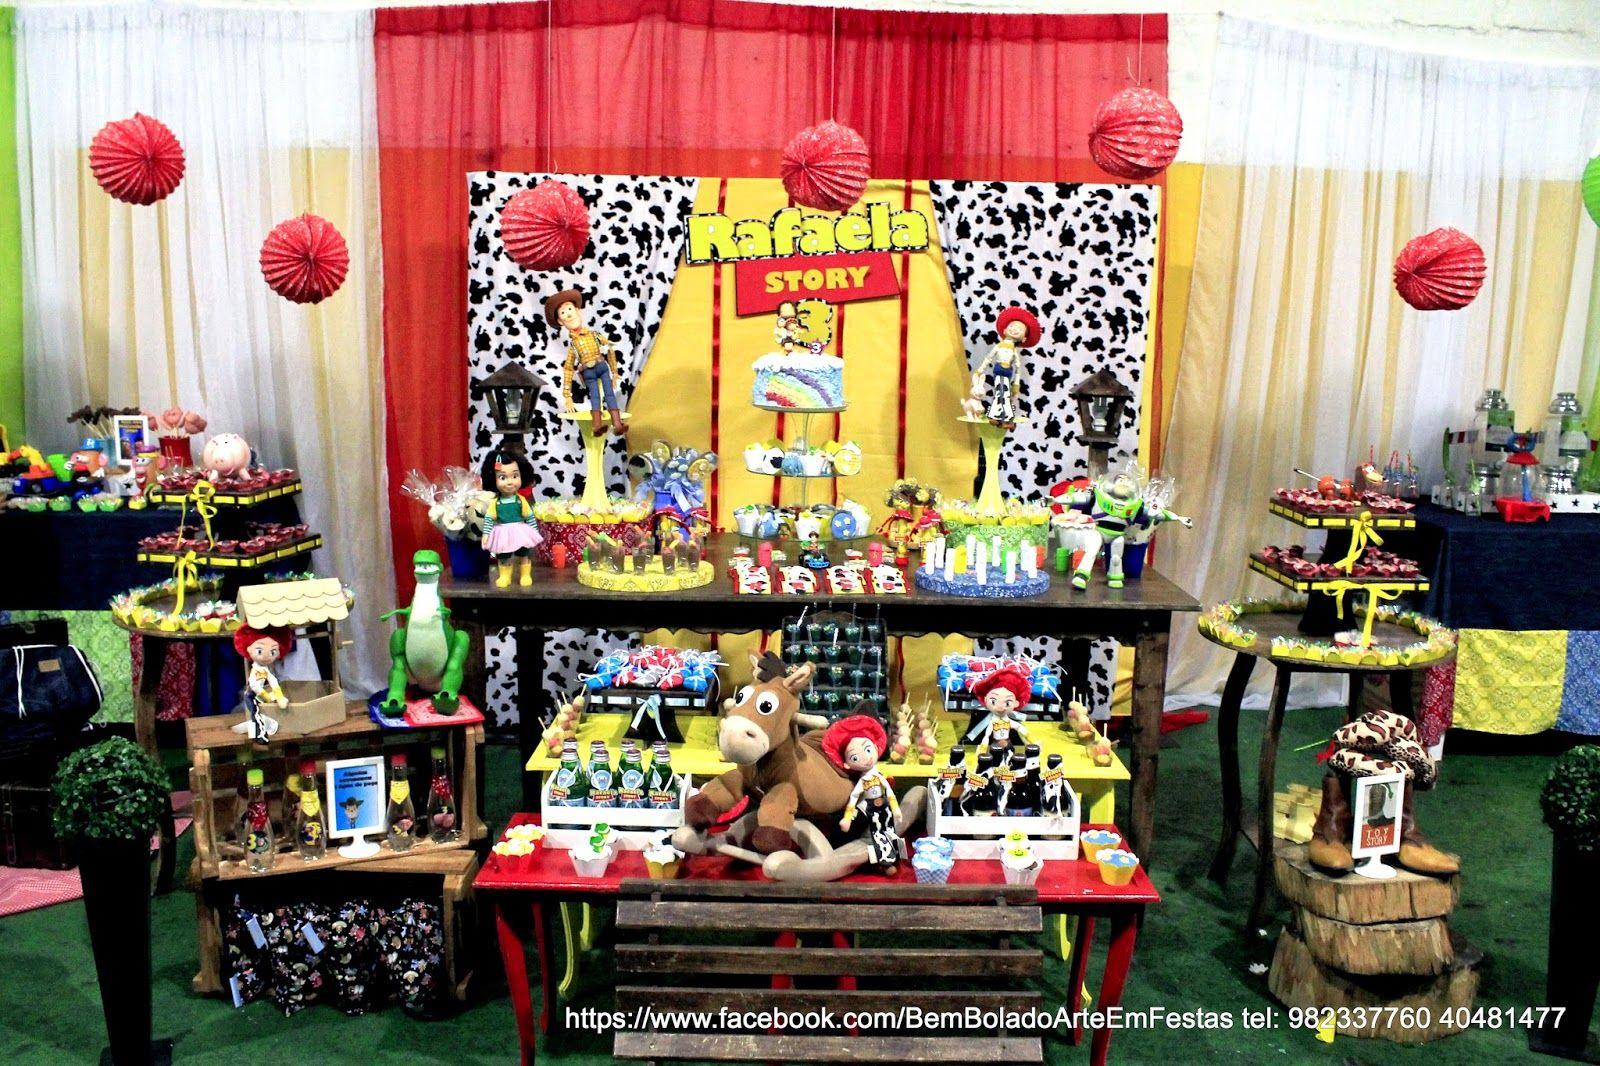 bem bolado daniela genari: Toy Story ( Rafaela Story 3)